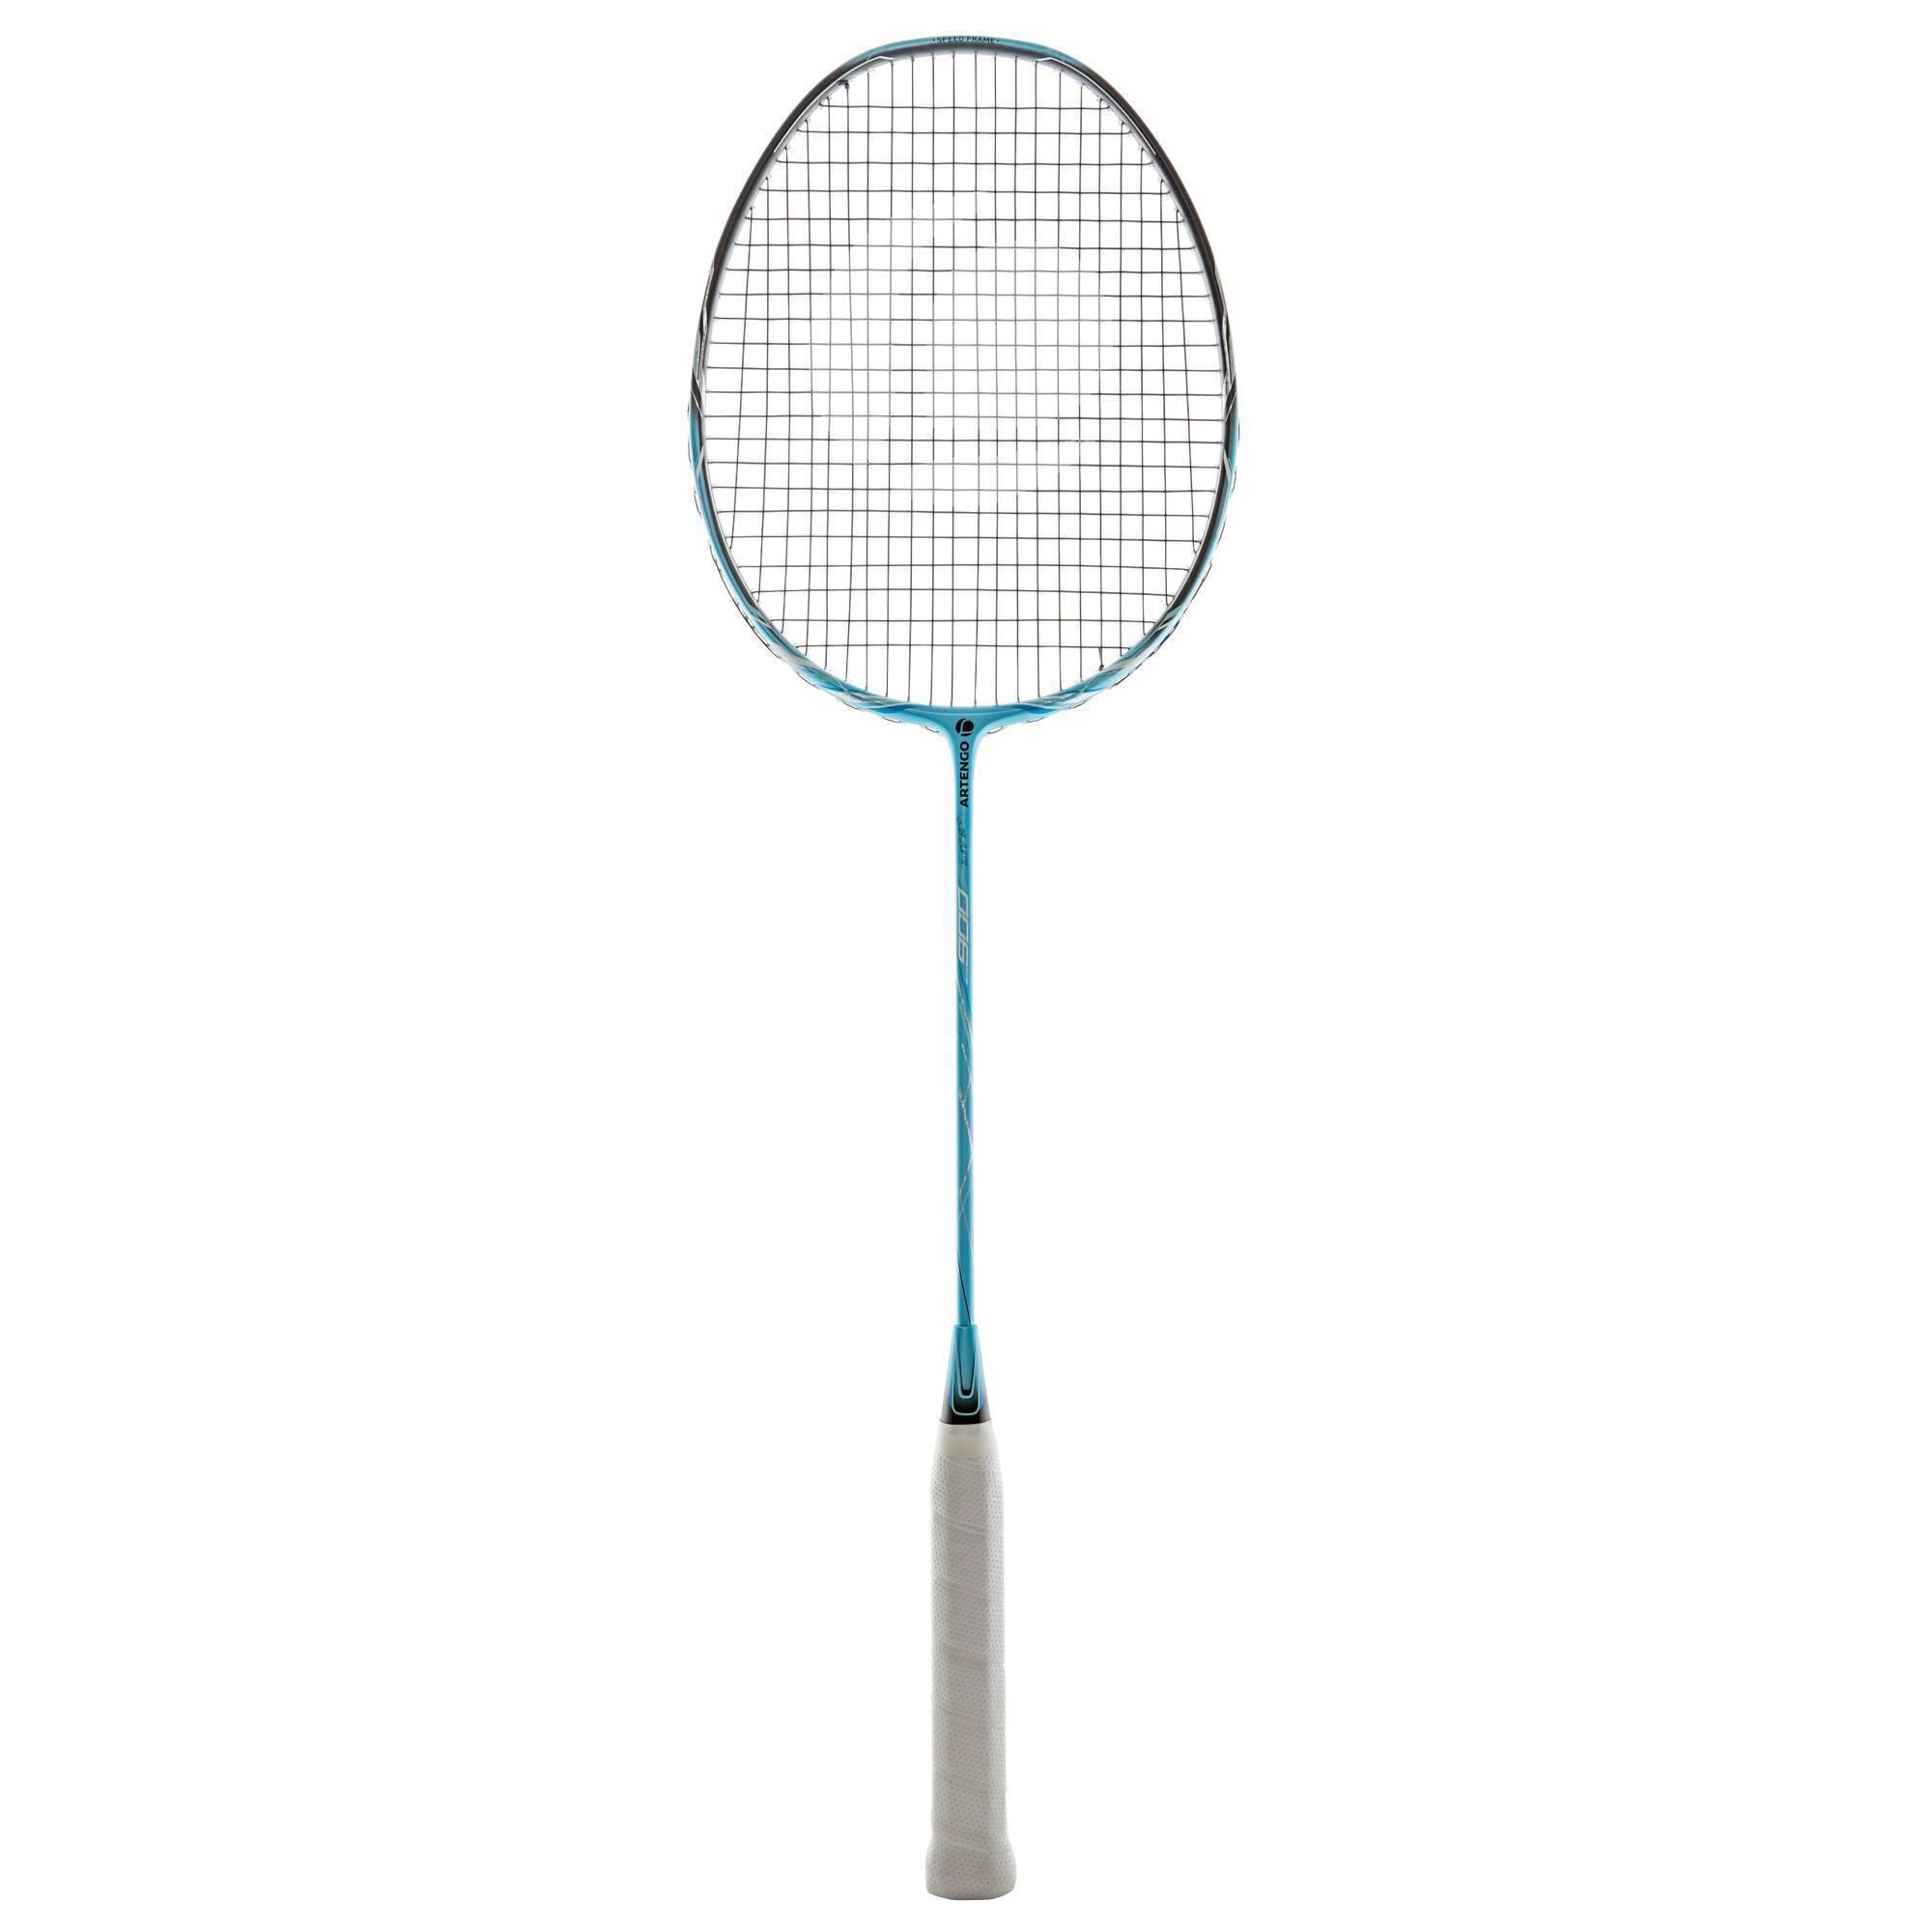 Raquette de Badminton Adulte BR 900 Ultra Lite S - Bleu Ciel